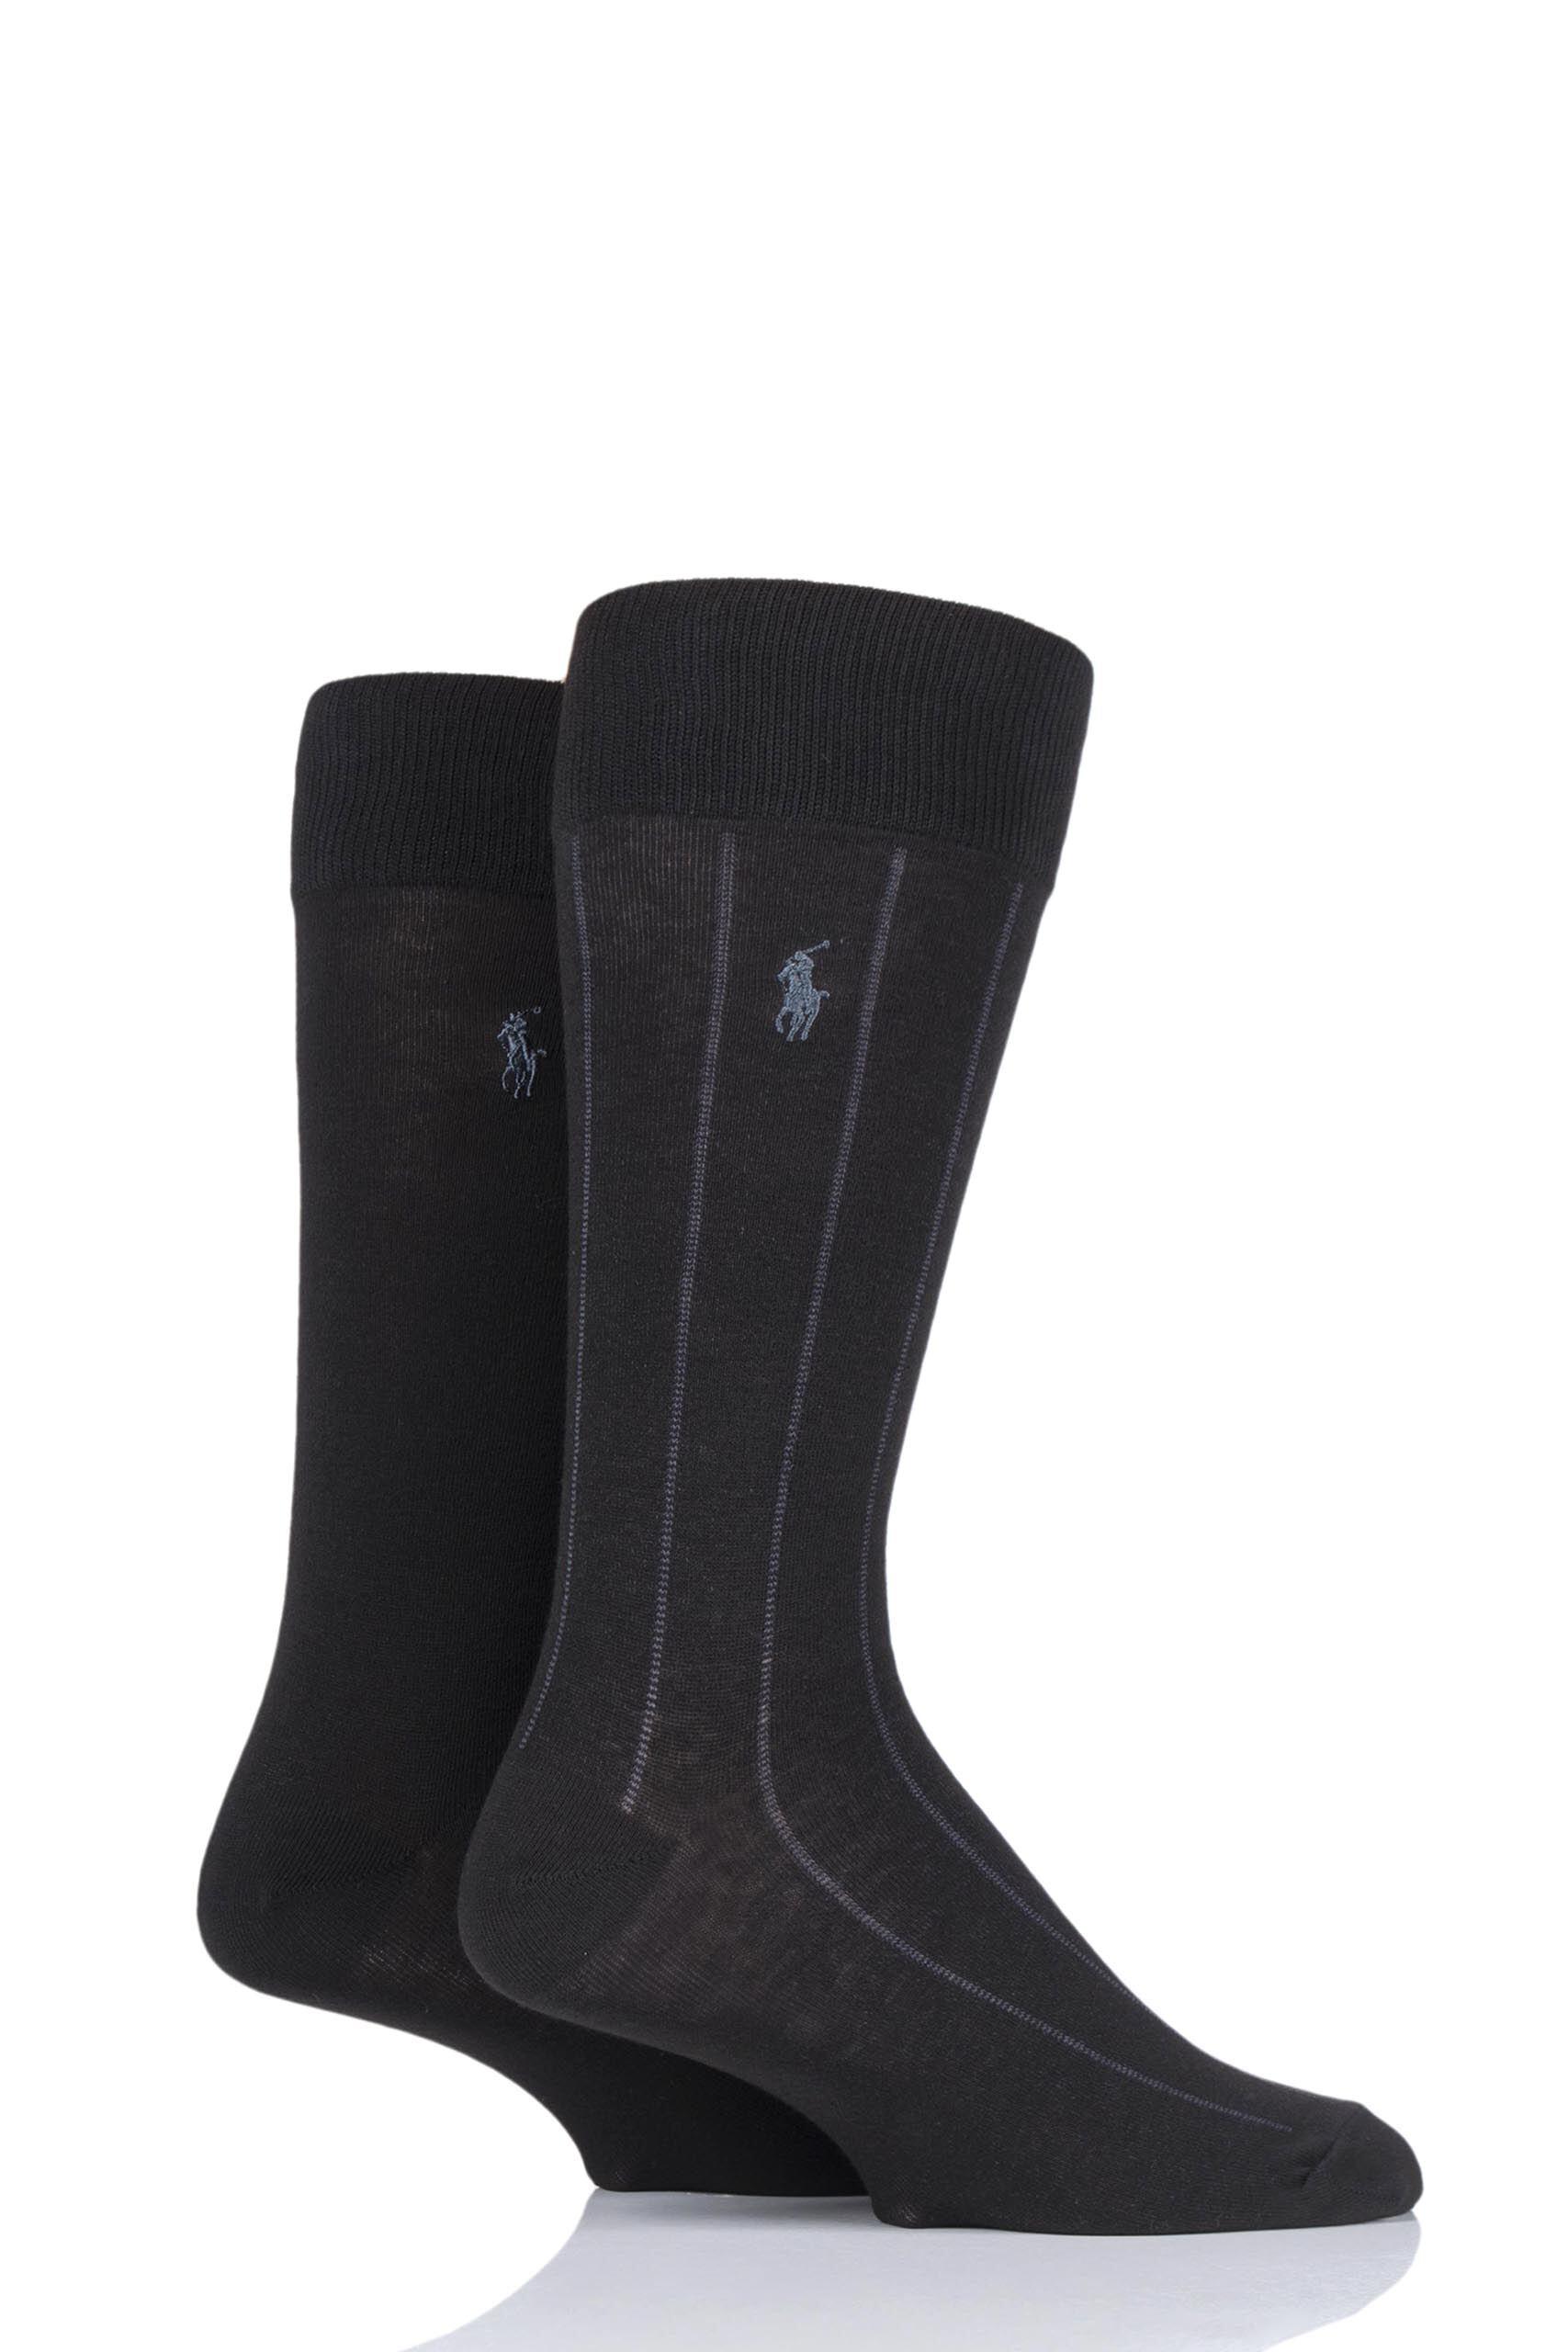 Image of 2 Pair Black Cotton Vertical Stripe and Plain Socks Men's 6-11 Mens - Ralph Lauren